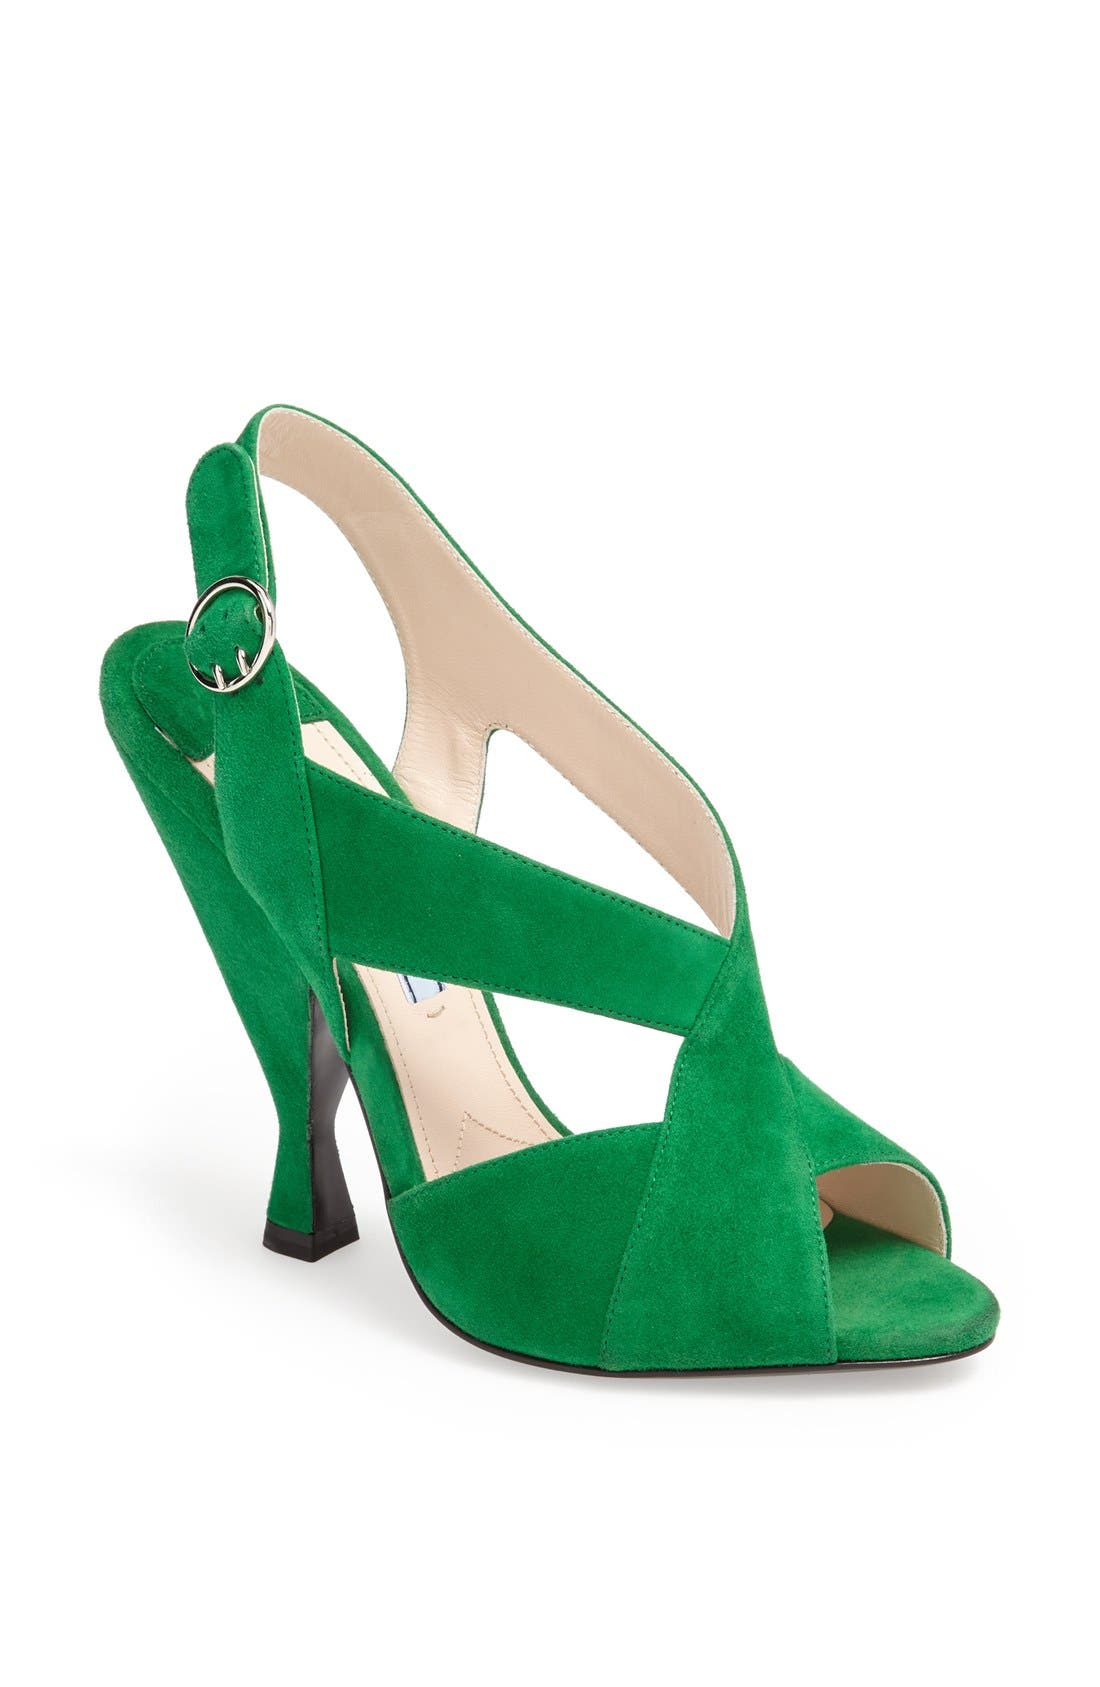 Main Image - Prada 'Hourglass' Slingback Sandal